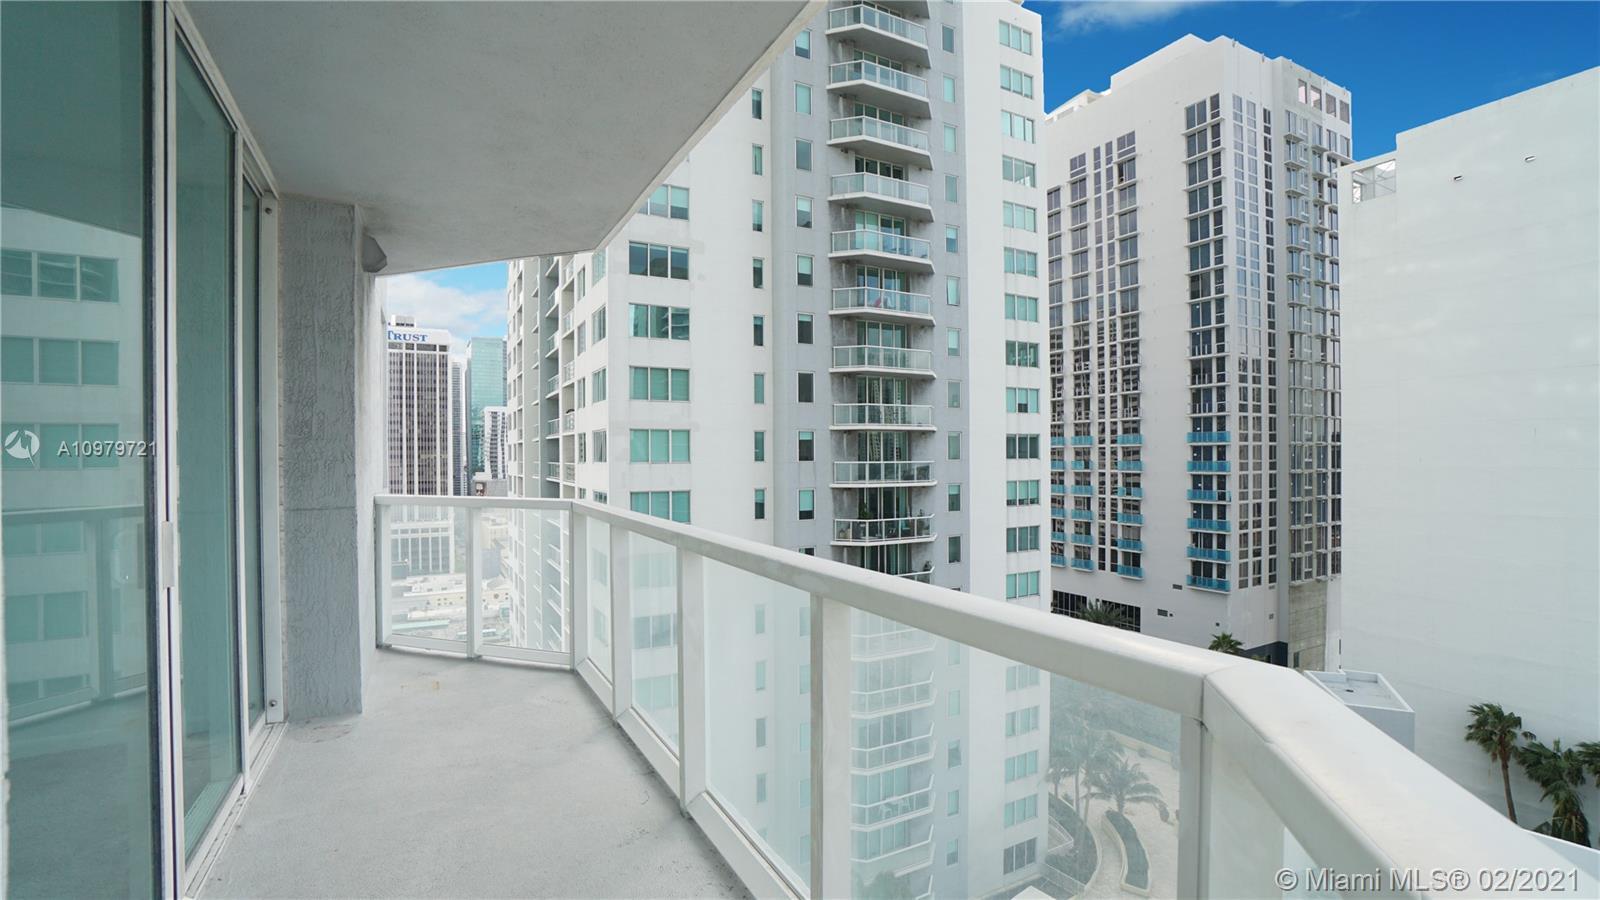 Vizcayne One #1810 - 244 Biscayne Blvd #1810, Miami, FL 33132